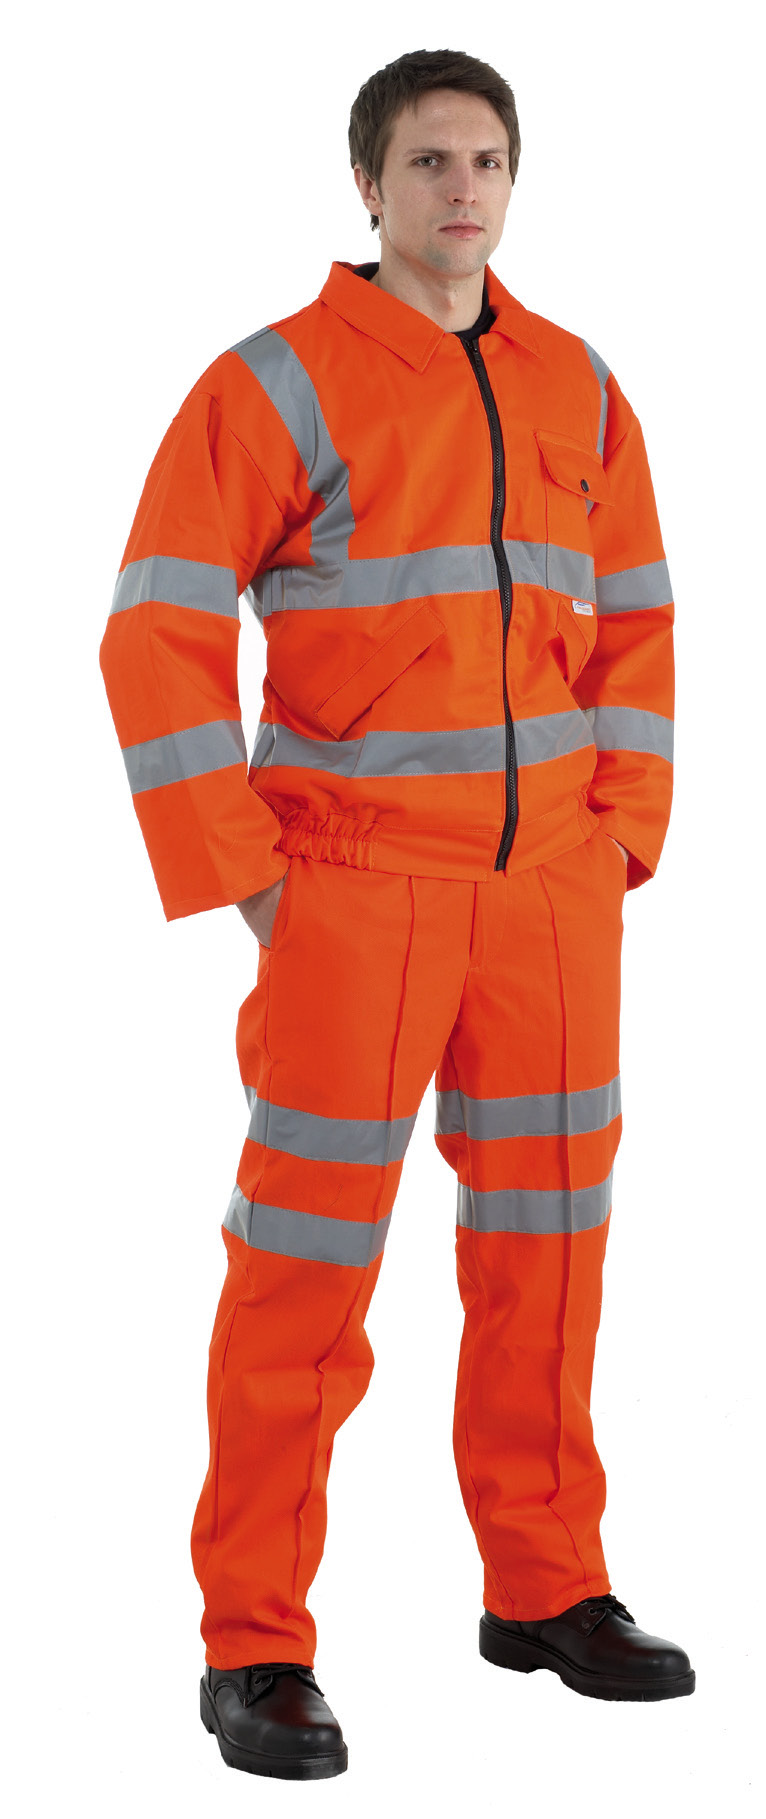 bodyguard-Heat-and-Flame-Resistant-Hi-Vis-Flame-Retardant-Work-Jacket